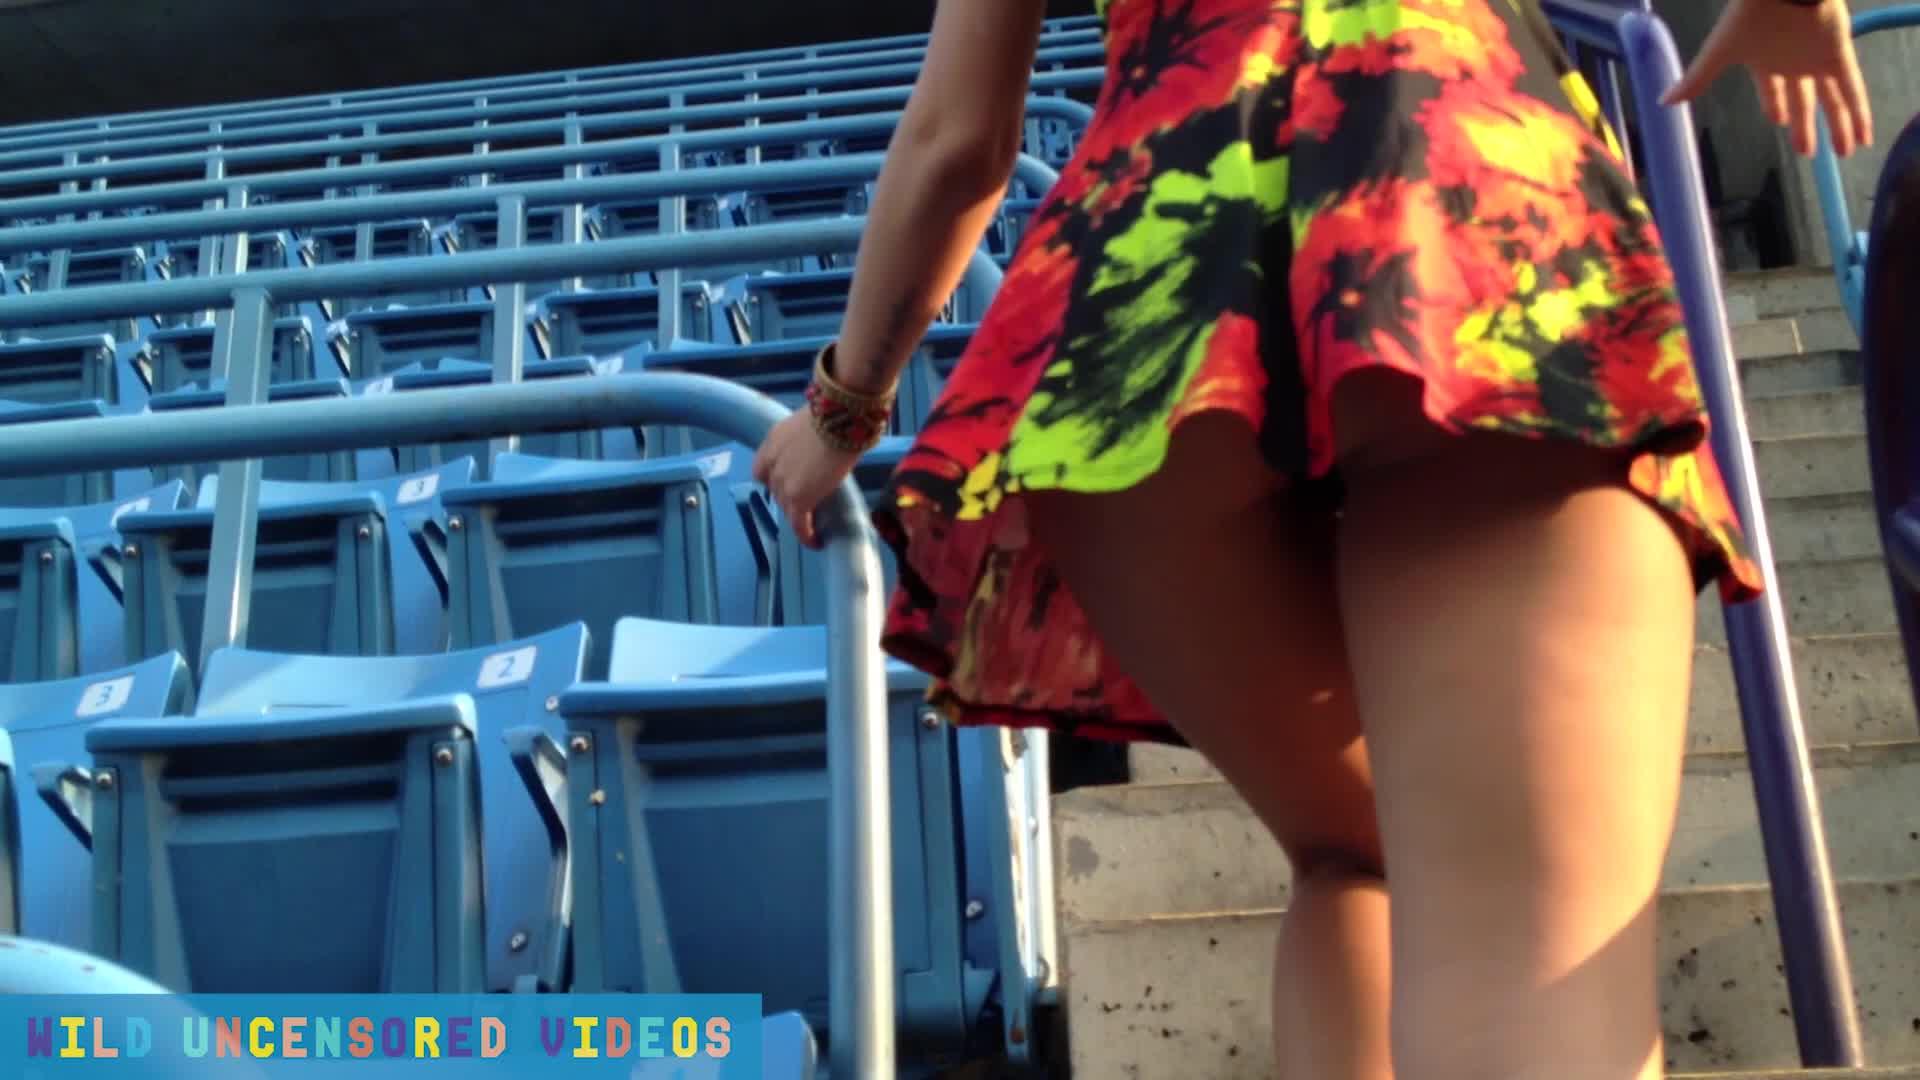 Baseball Game Sex Video 8